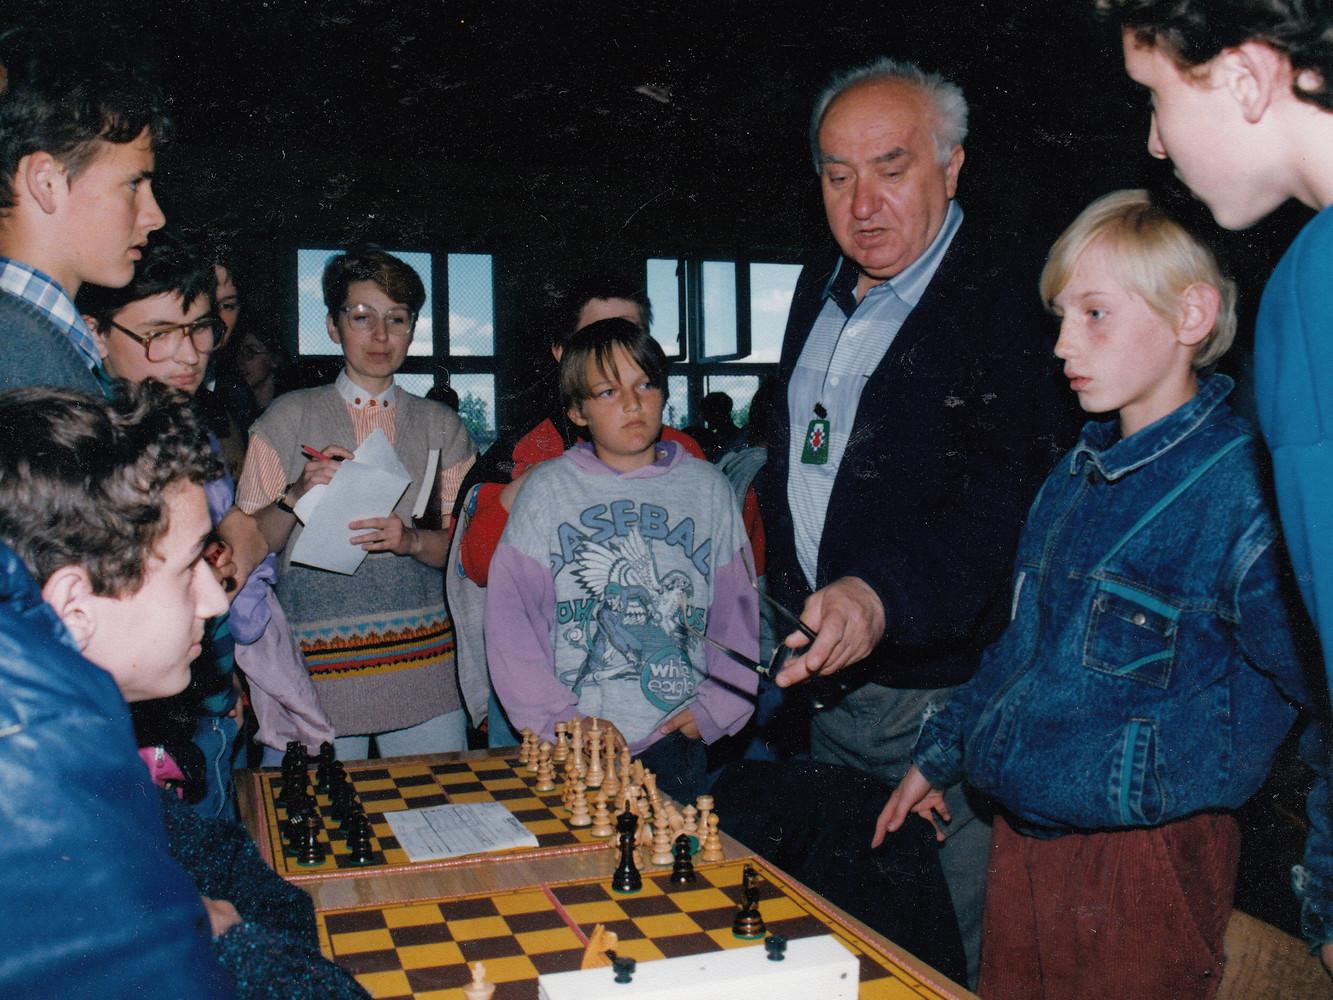 Emil Olej